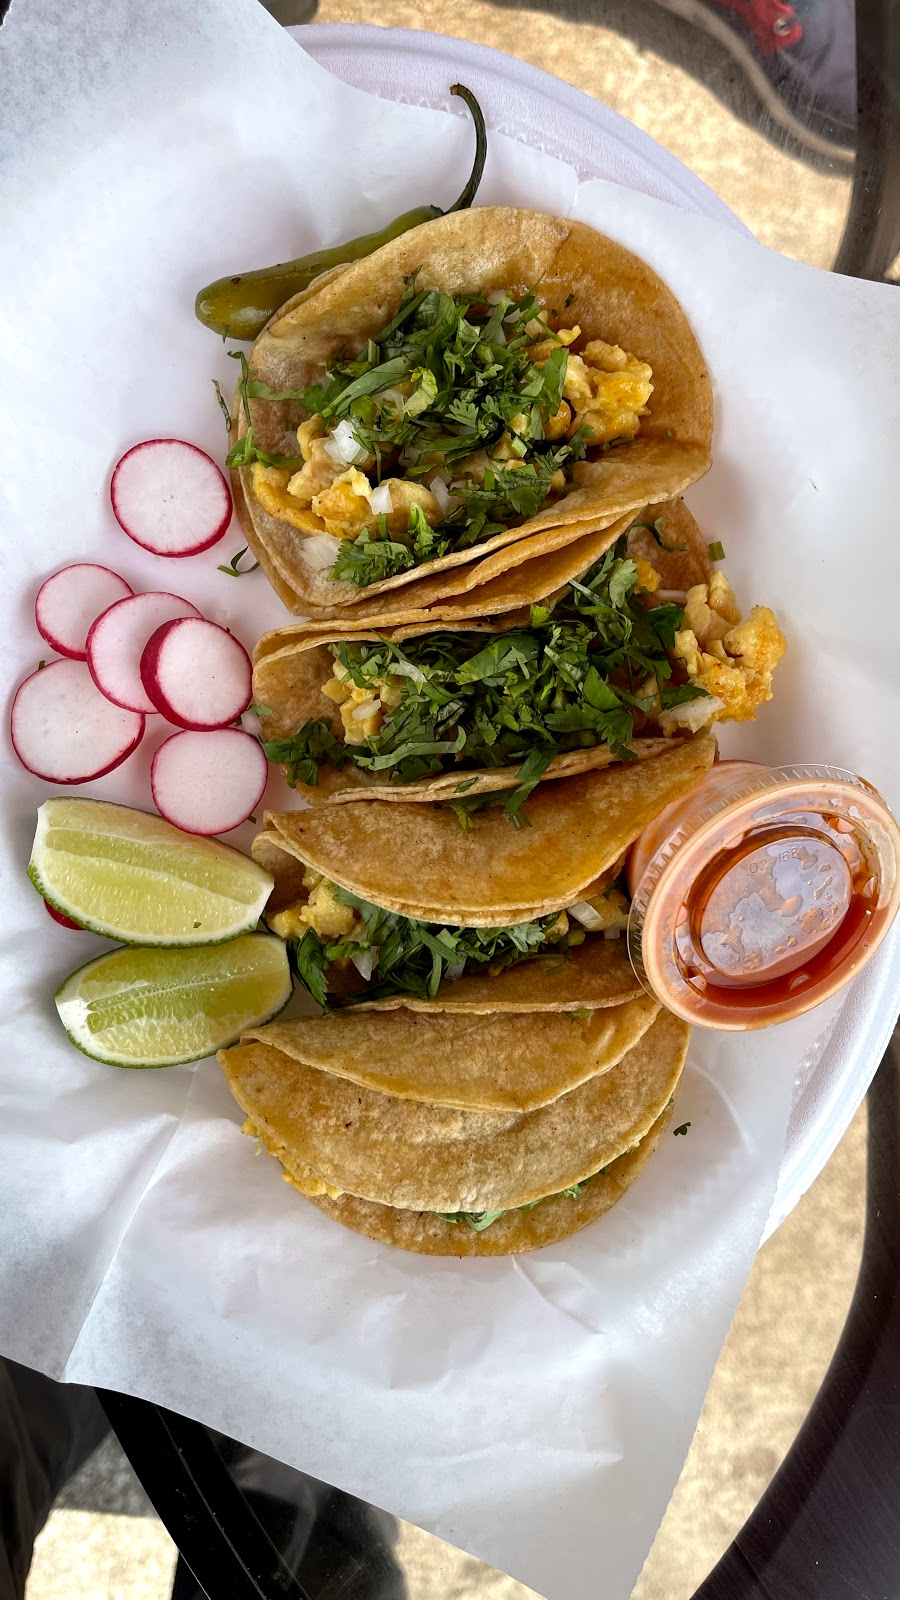 Oaxaca Flavors   restaurant   15 Hughes Rd, Madison, AL 35758, USA   2566316185 OR +1 256-631-6185